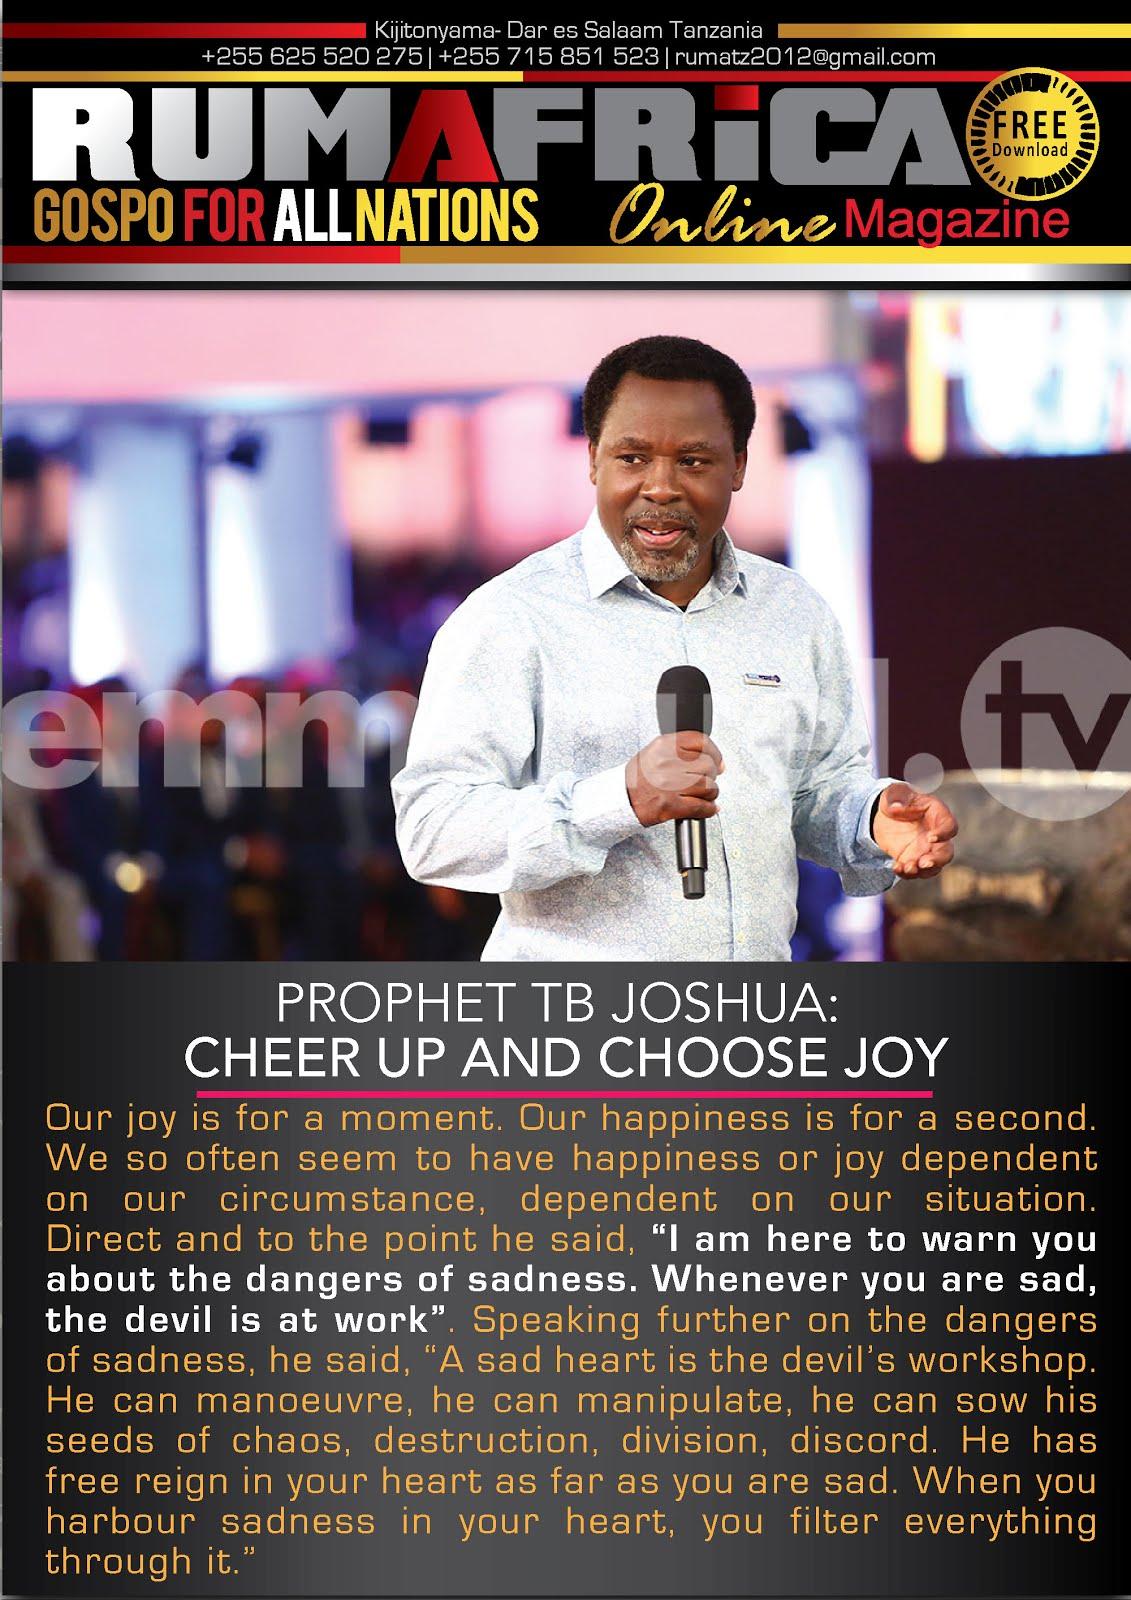 PROPHET TB JOSHUA.